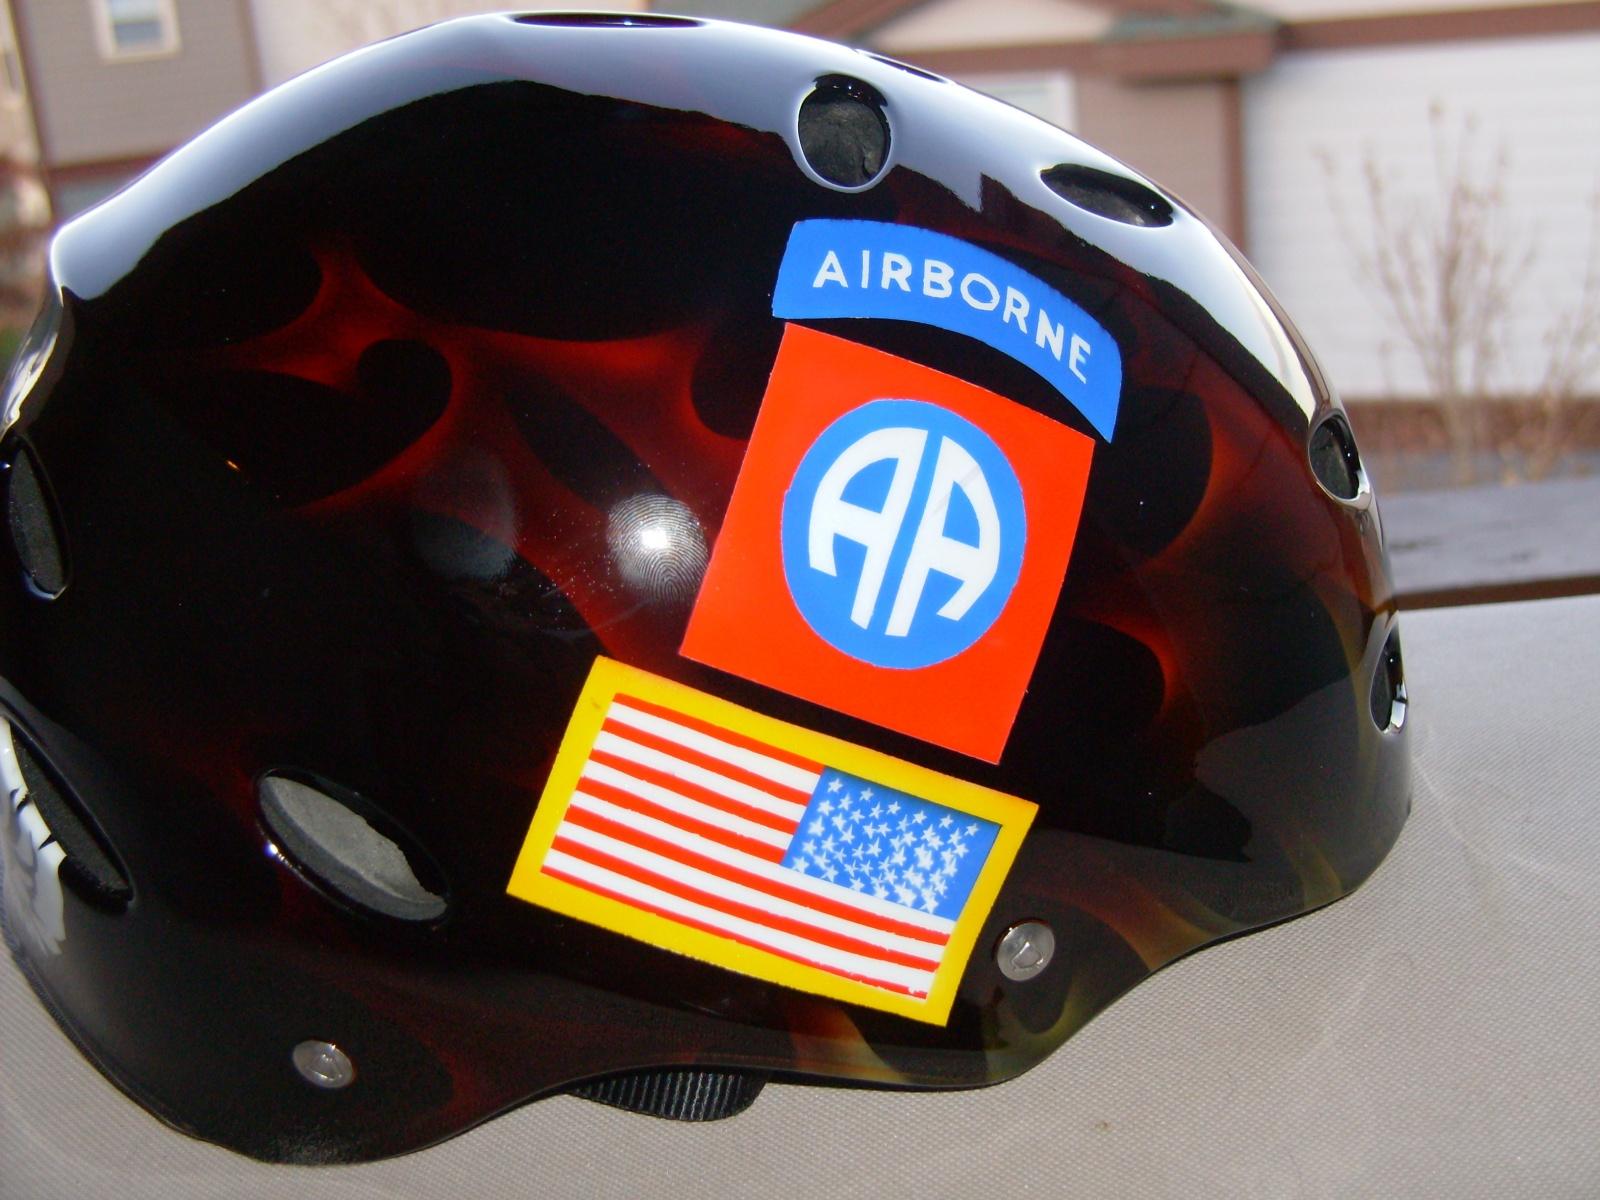 Click image for larger version  Name:Custom kayak helmet 007.jpg Views:498 Size:516.7 KB ID:845